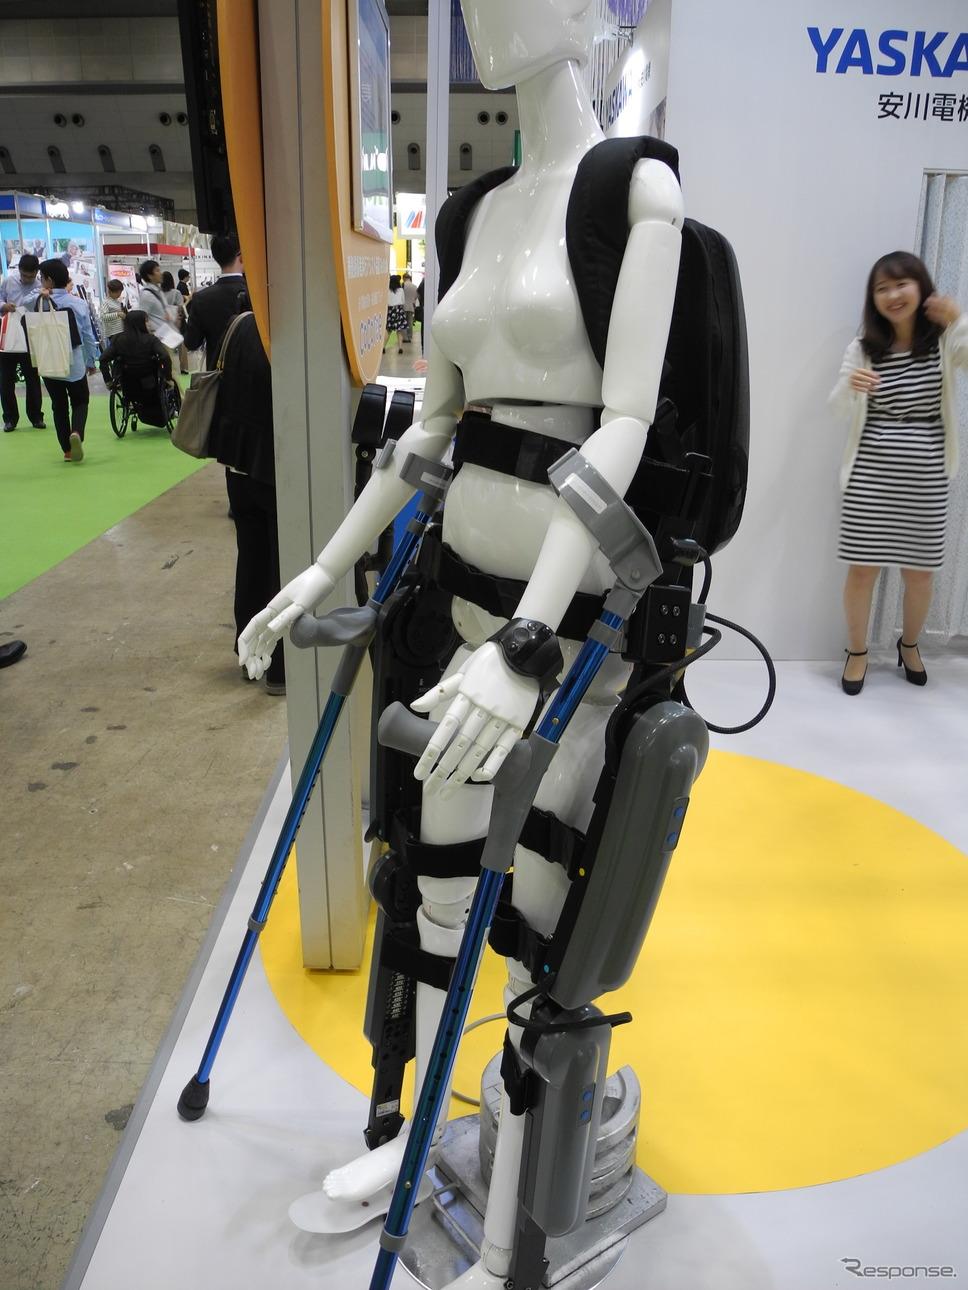 脊髄損傷者用歩行アシスト装置「ReWalk」(福祉機器展2017)《撮影 山田清志》